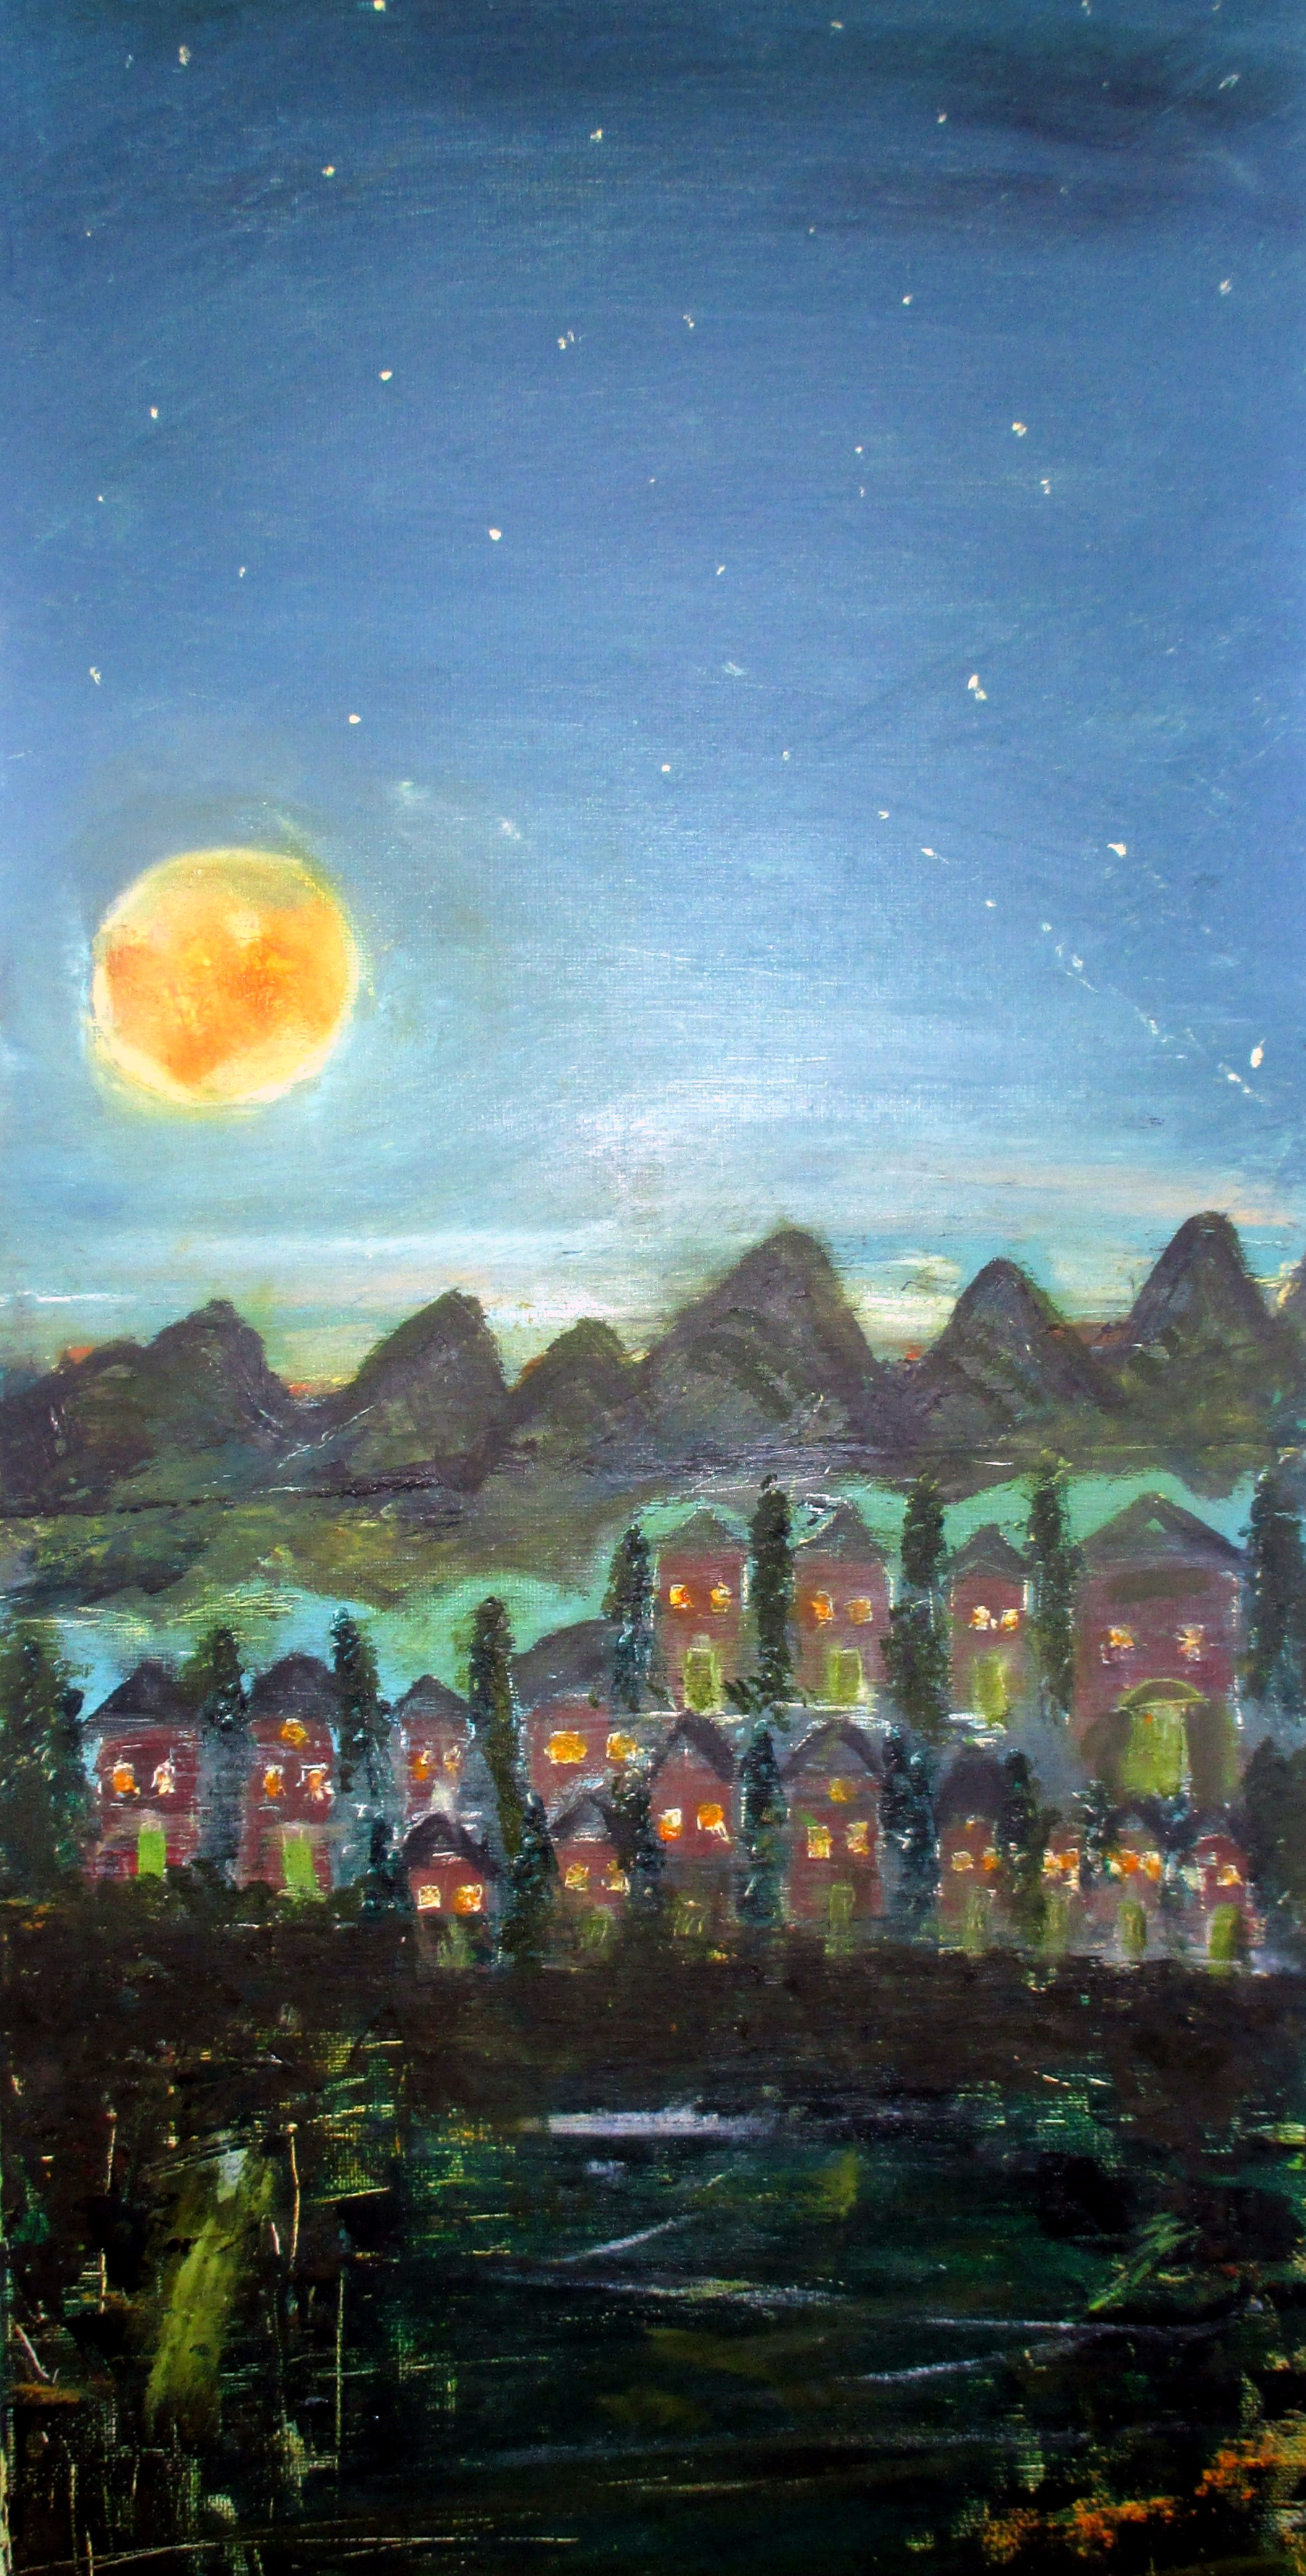 Full Moon Village